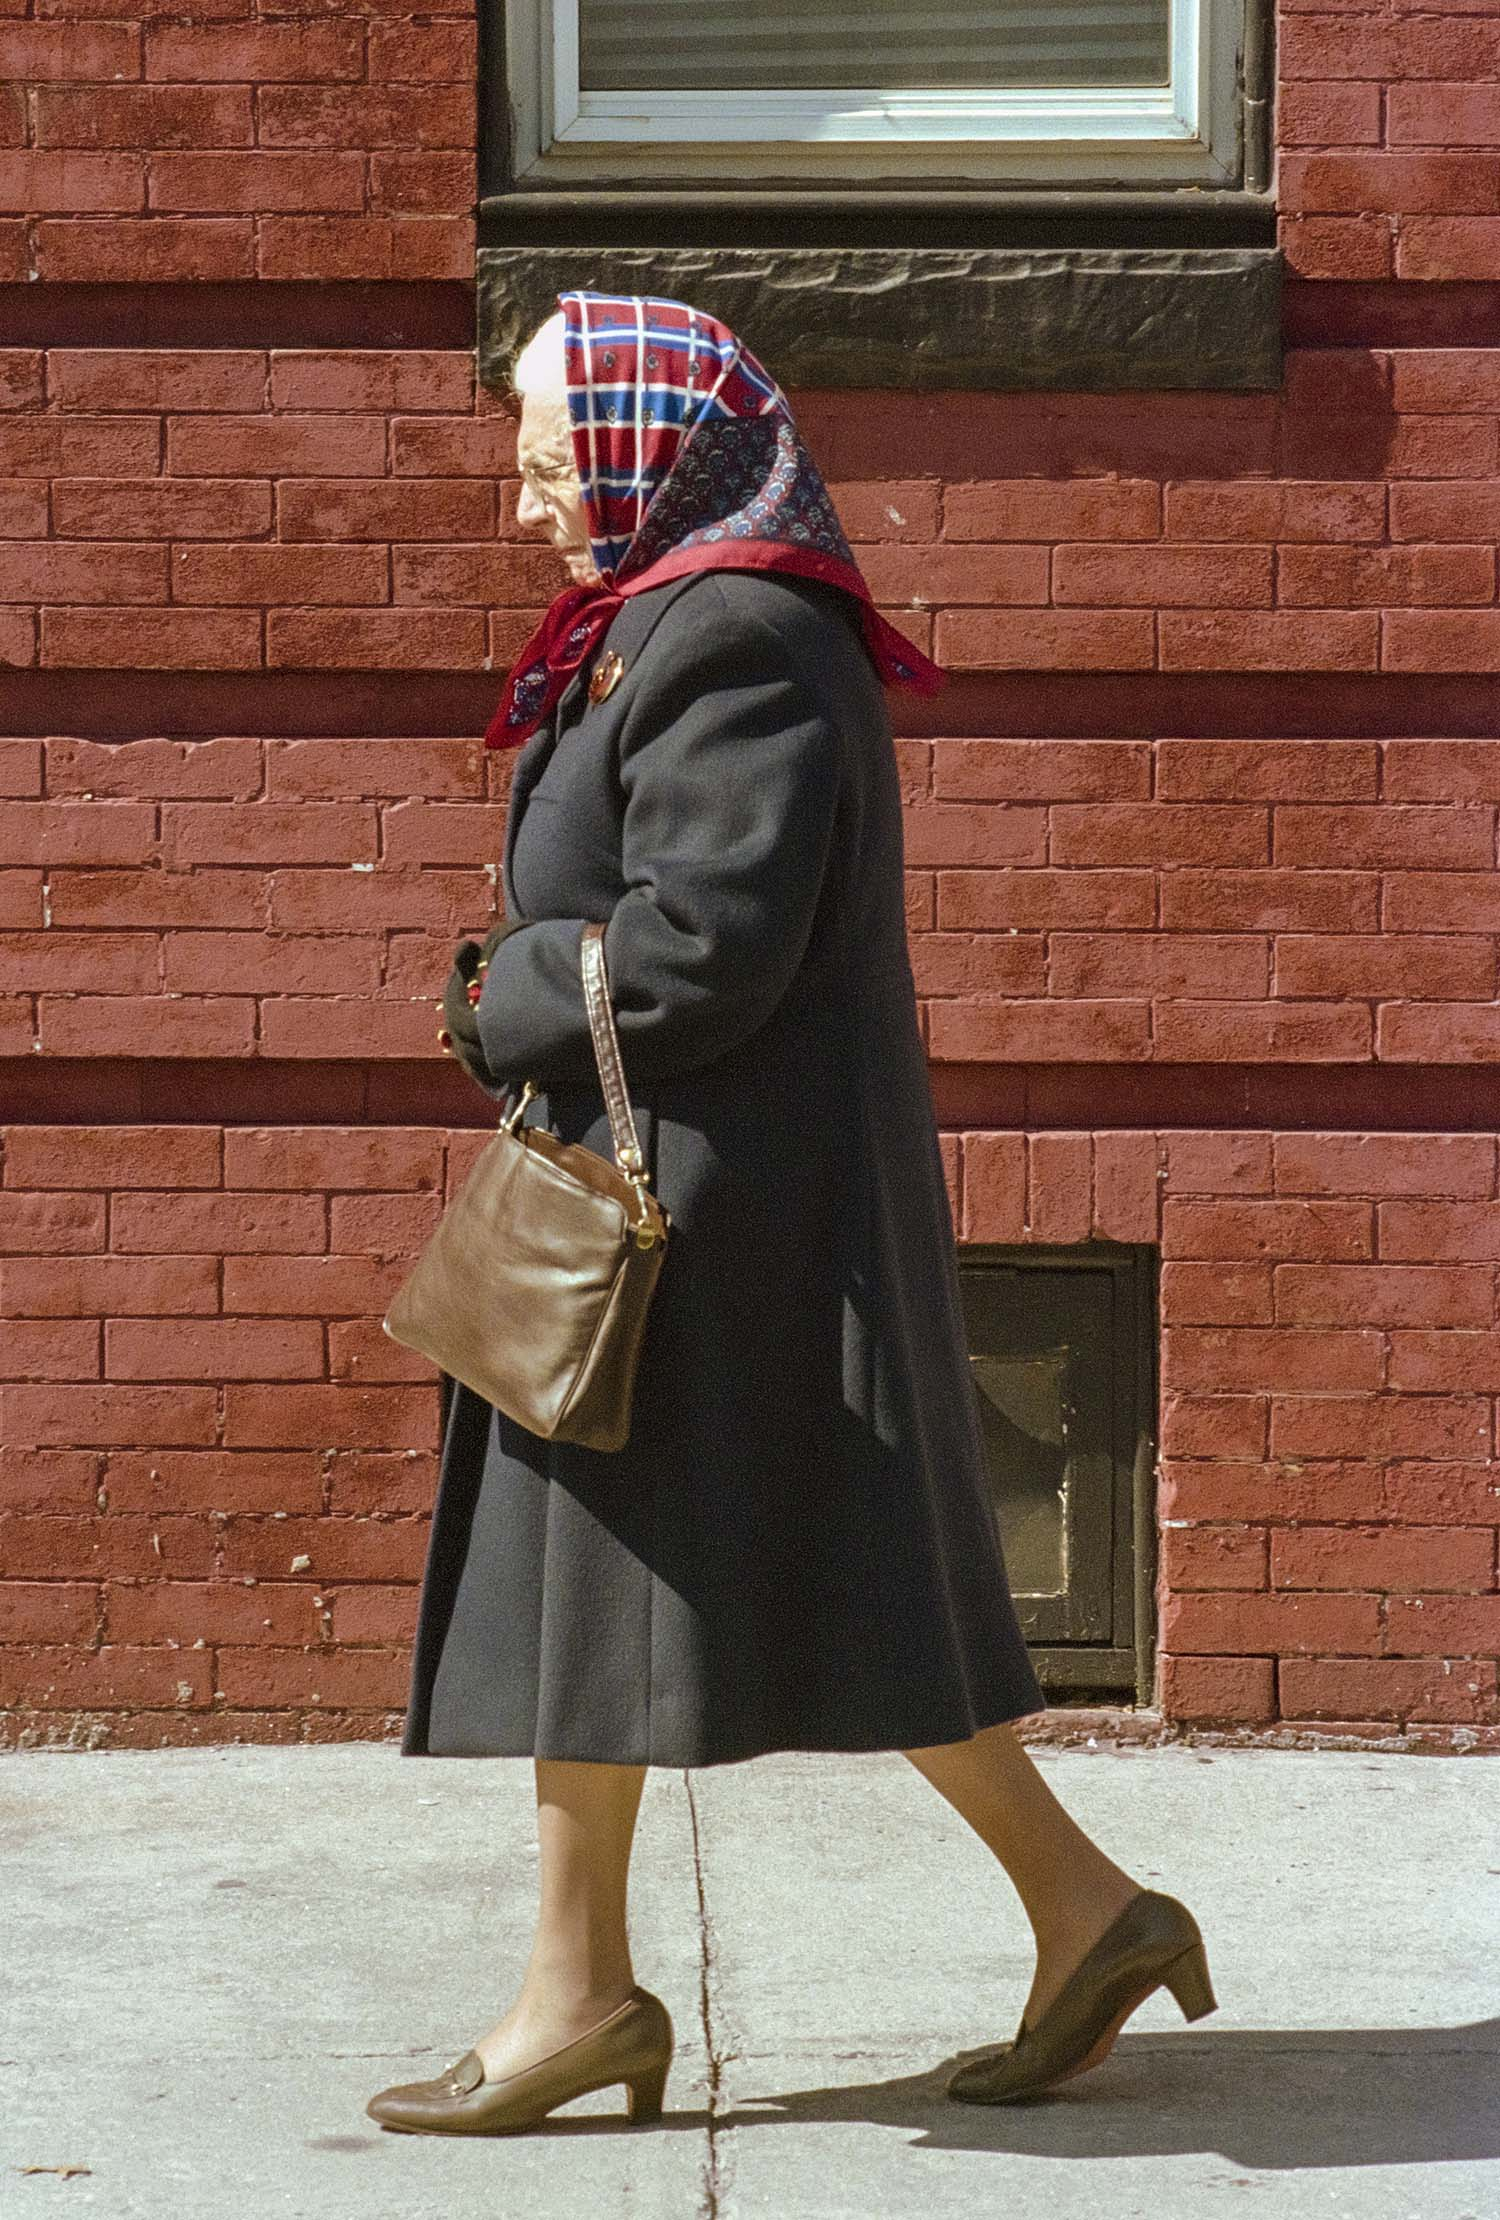 Maria Sofia, Heading Home After Mass